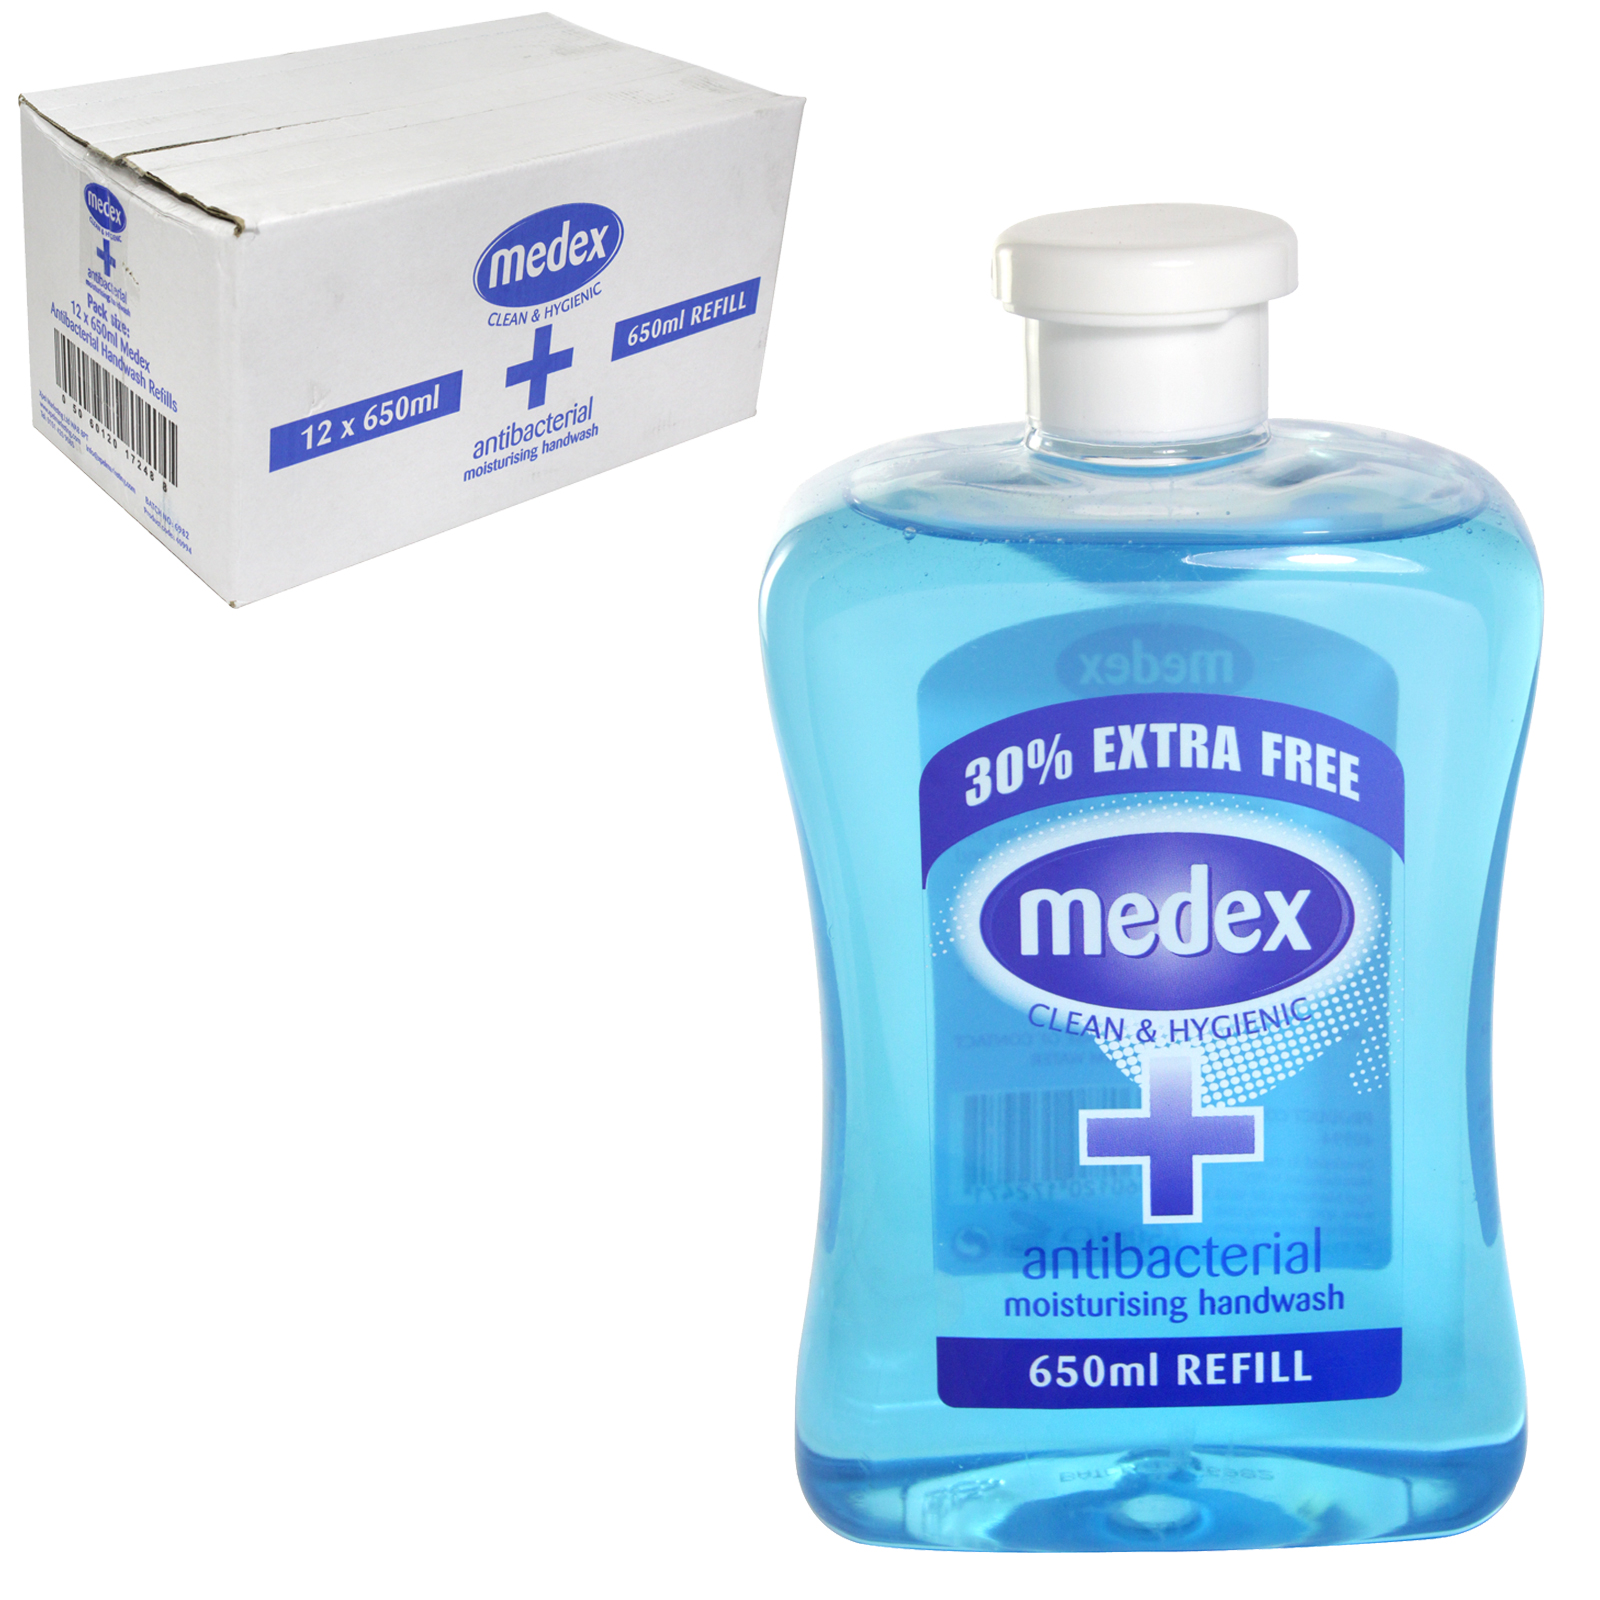 MEDEX ANTI-BAC HAND WASH FLIP CAP 650ML ORIGINAL X12